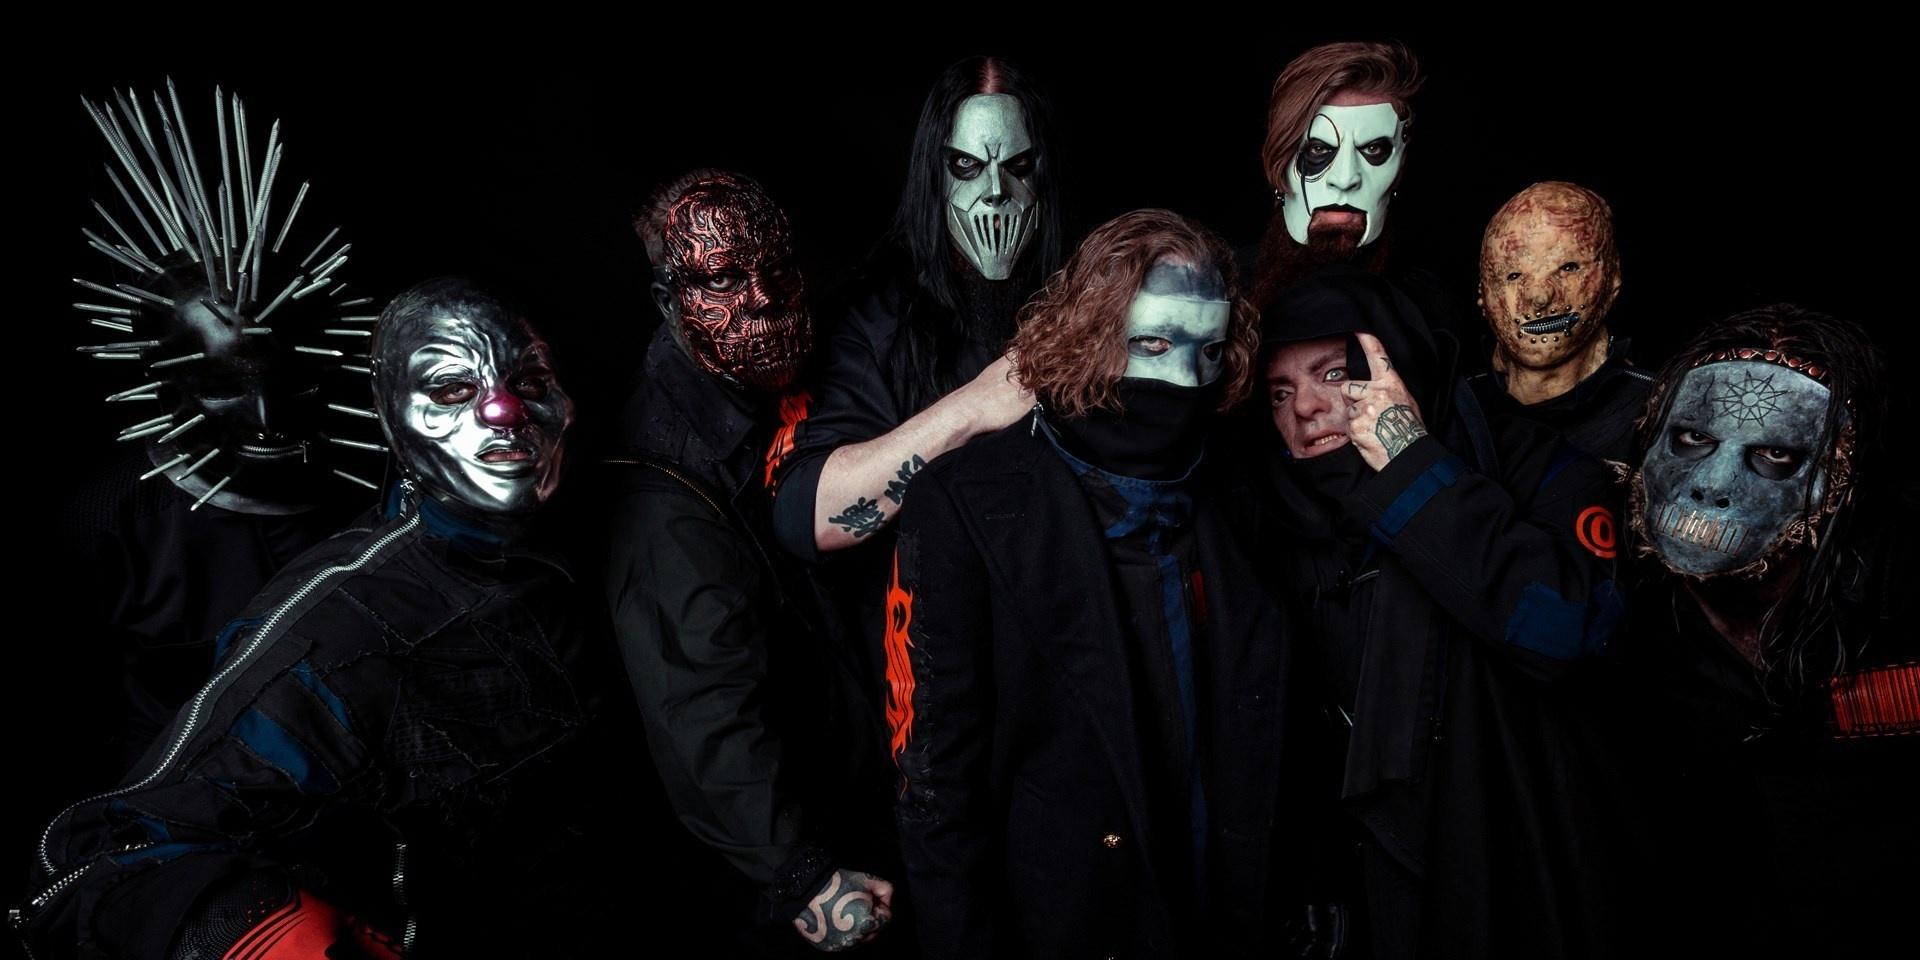 Slipknot will perform at Singapore Rockfest II next year